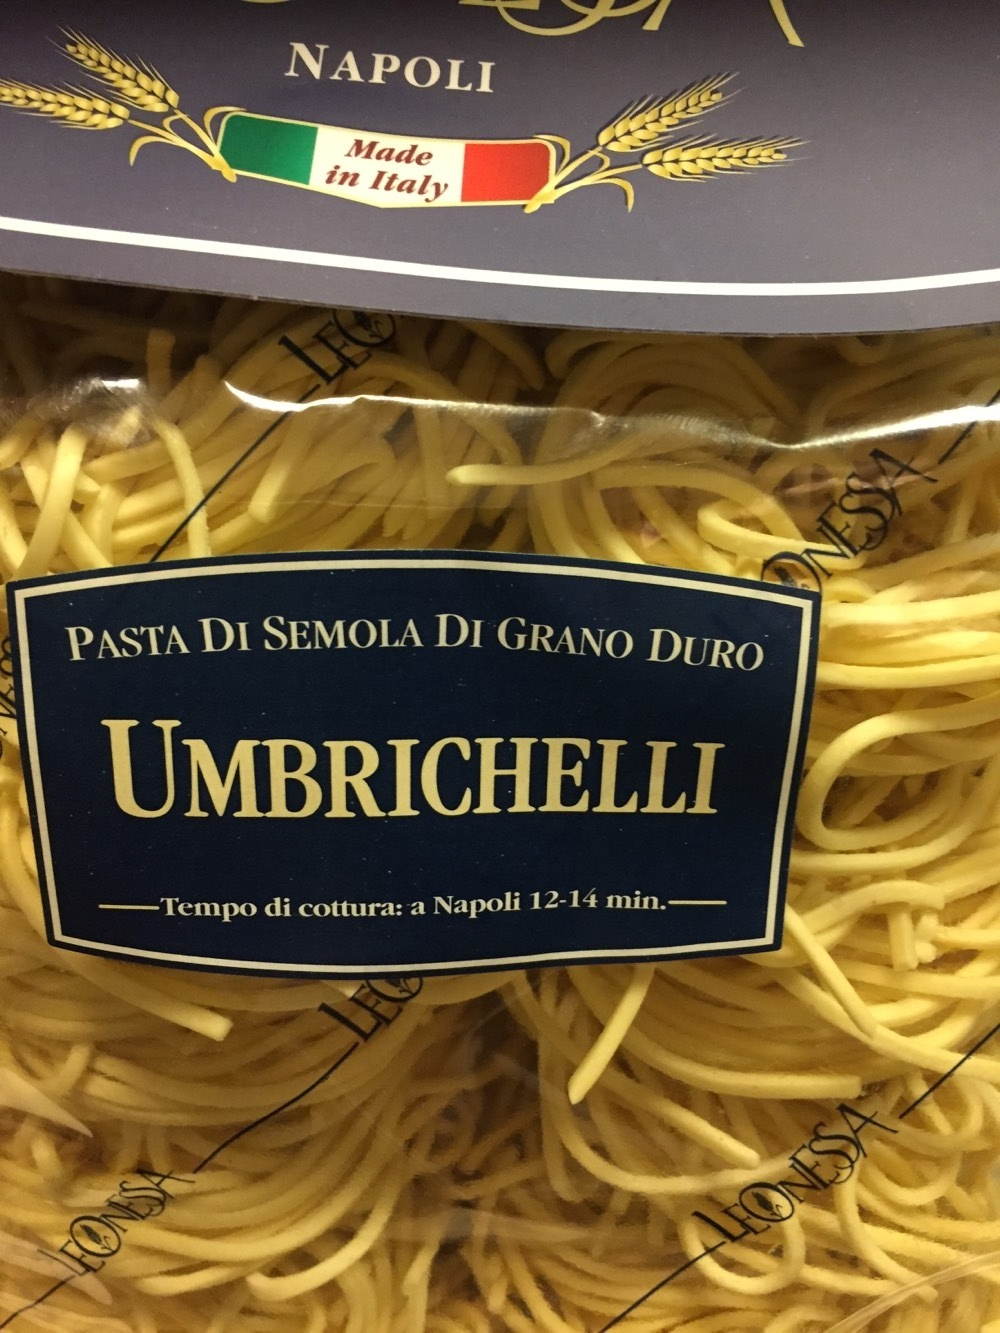 Umbrichelli - Product